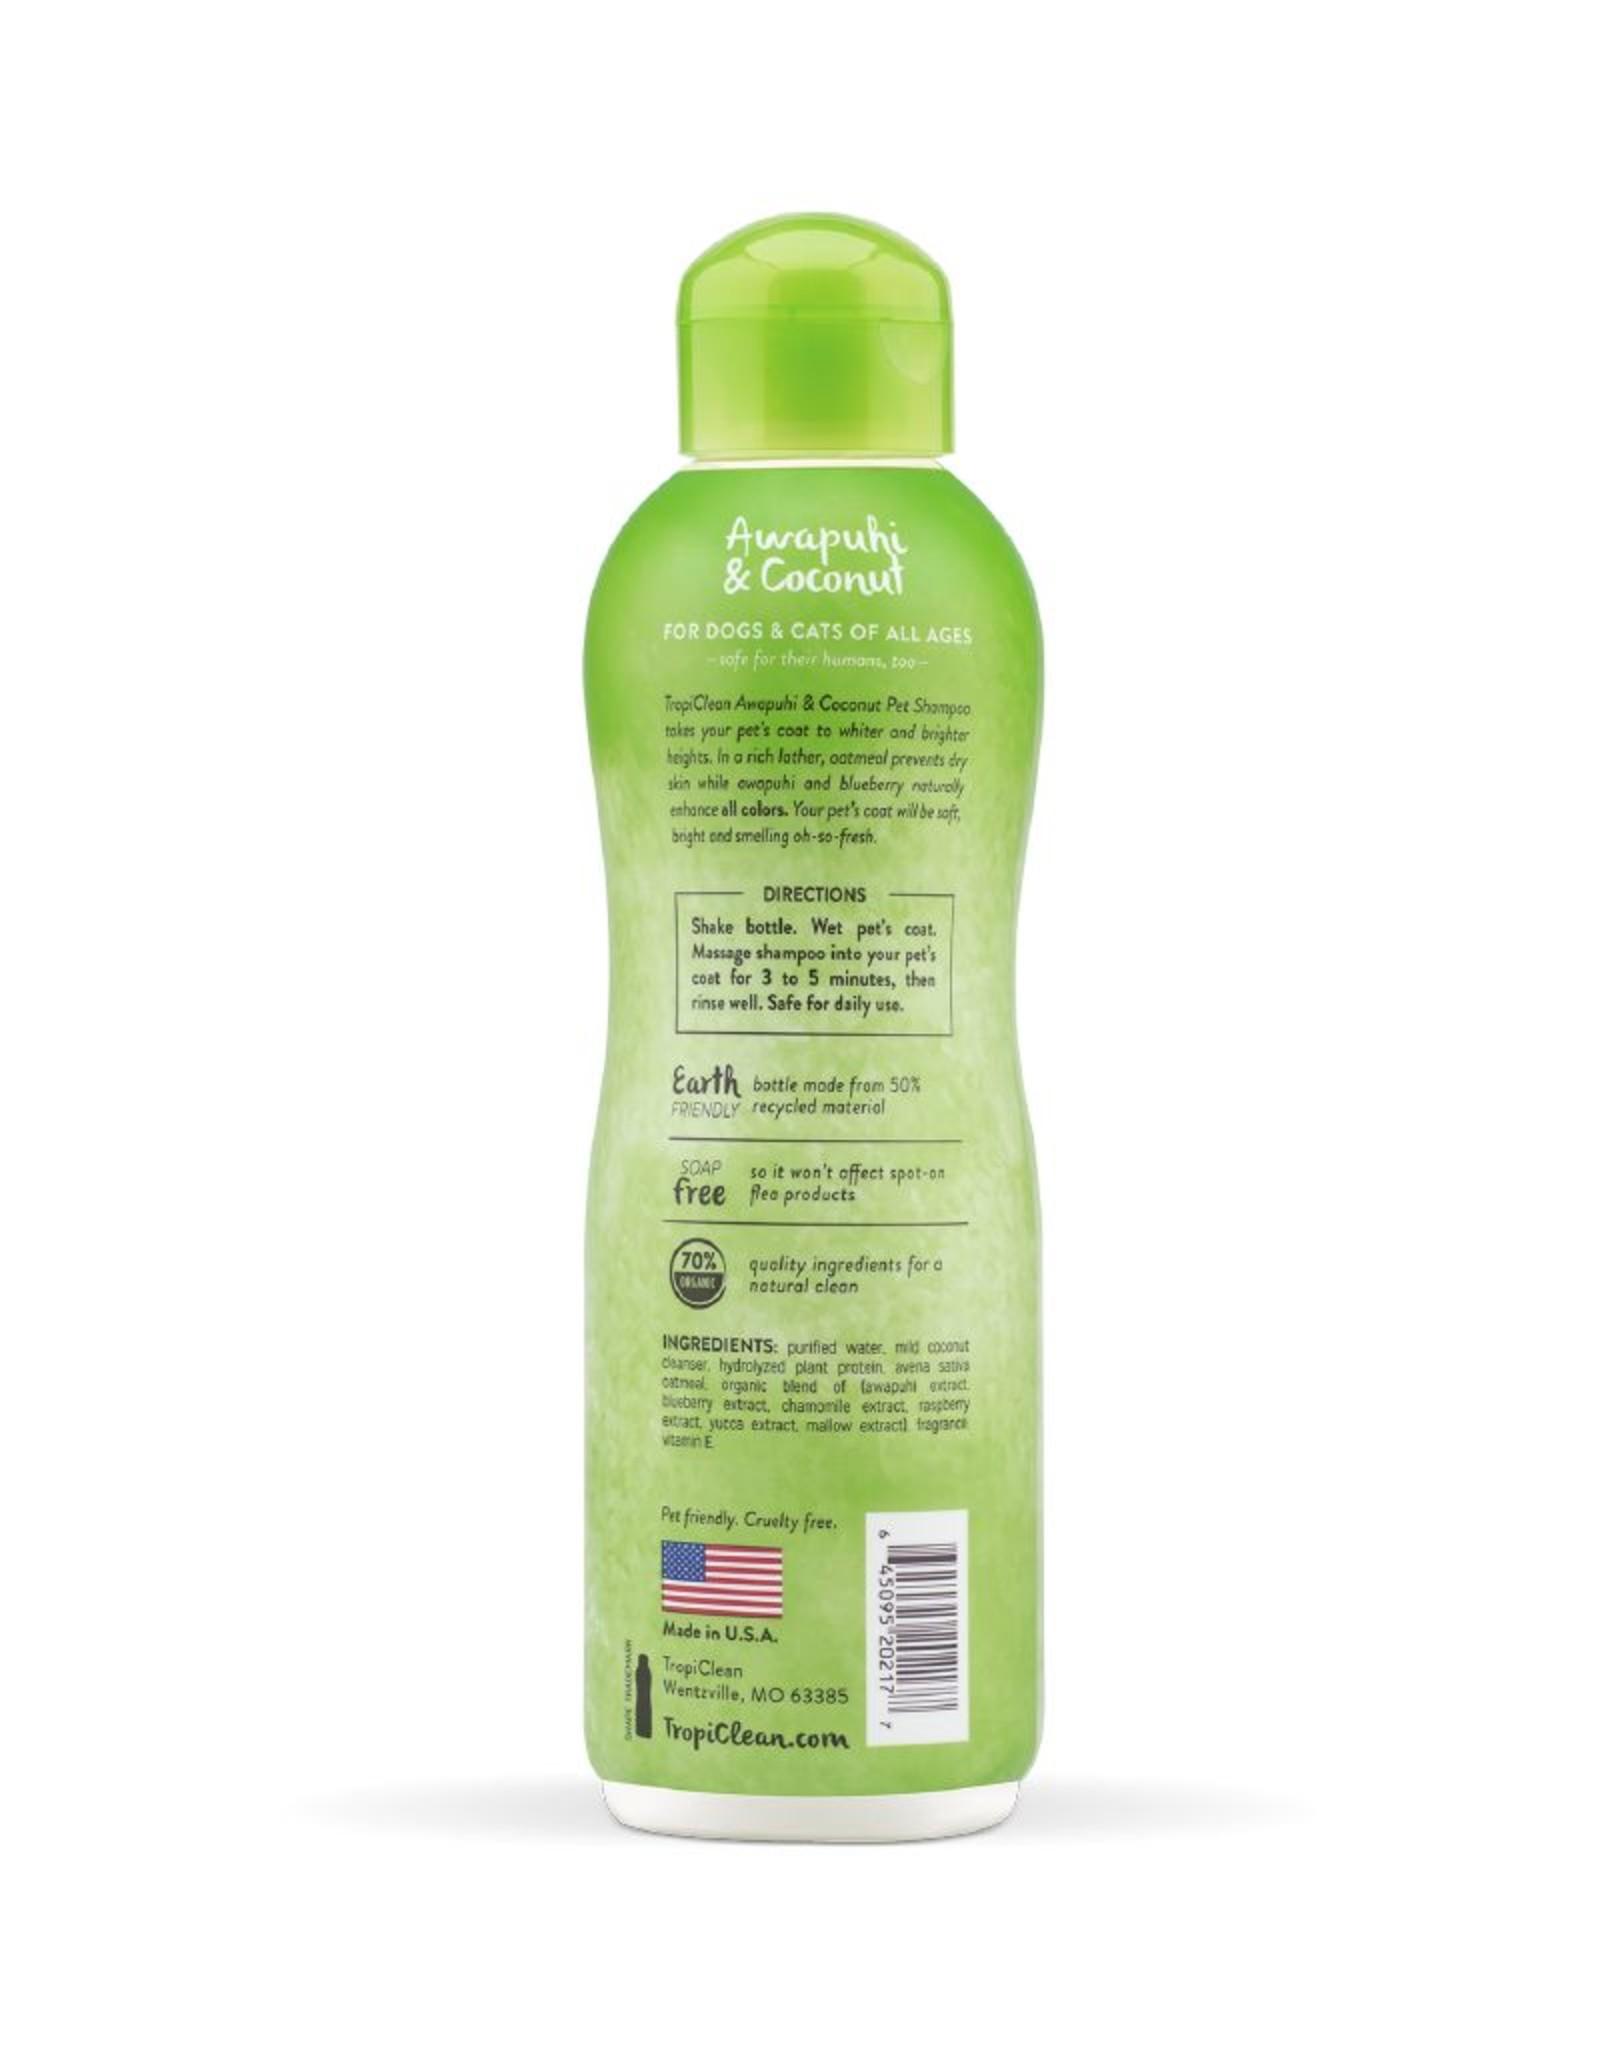 TROPICLEAN TropiClean | Awapuhi & Coconut Pet Shampoo 20 oz